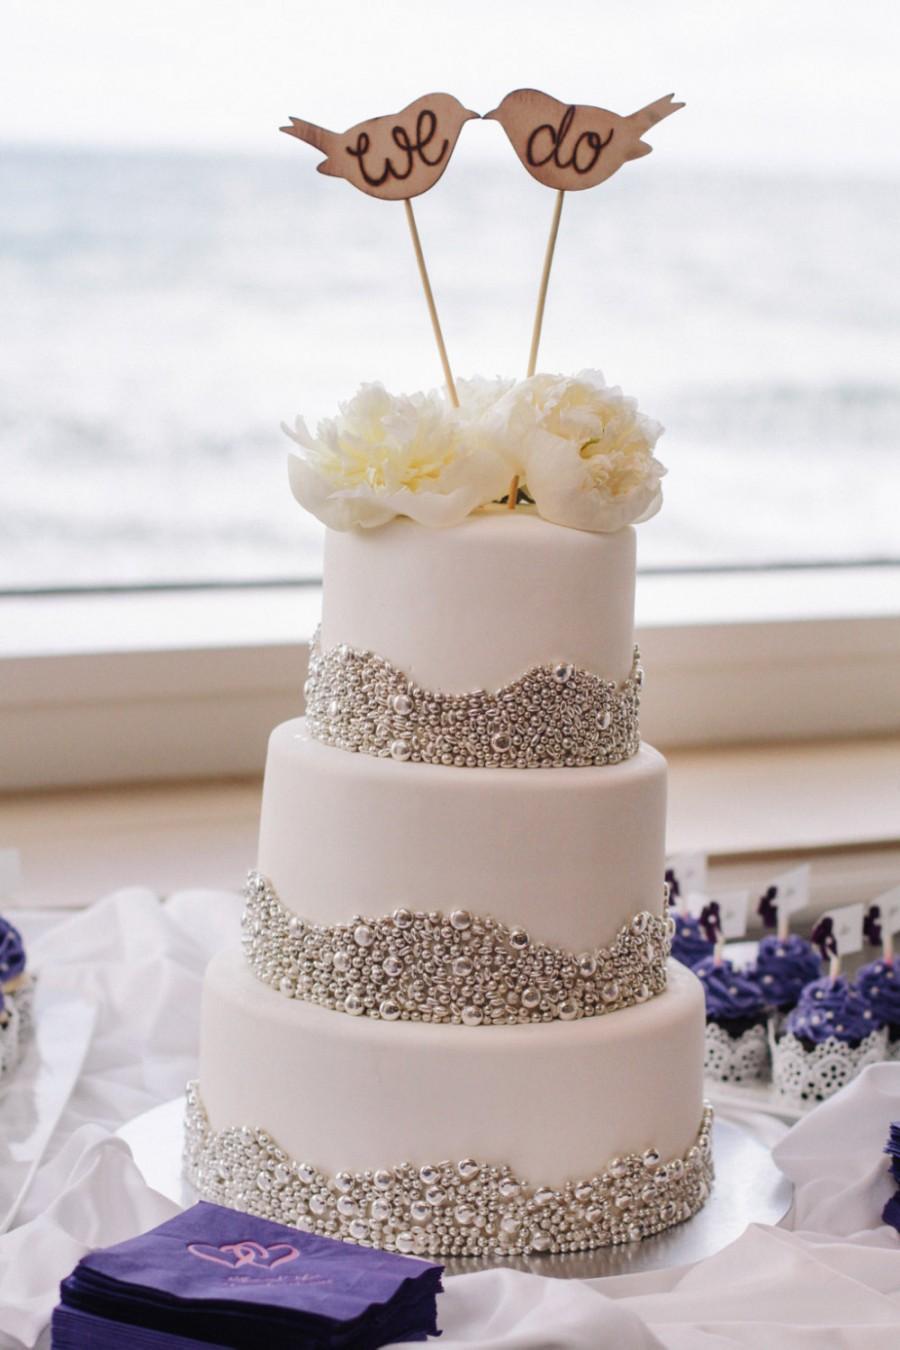 Mariage - Rustic Wedding Cake Topper Love Birds We Do Vintage Chic Decor (item E10634)